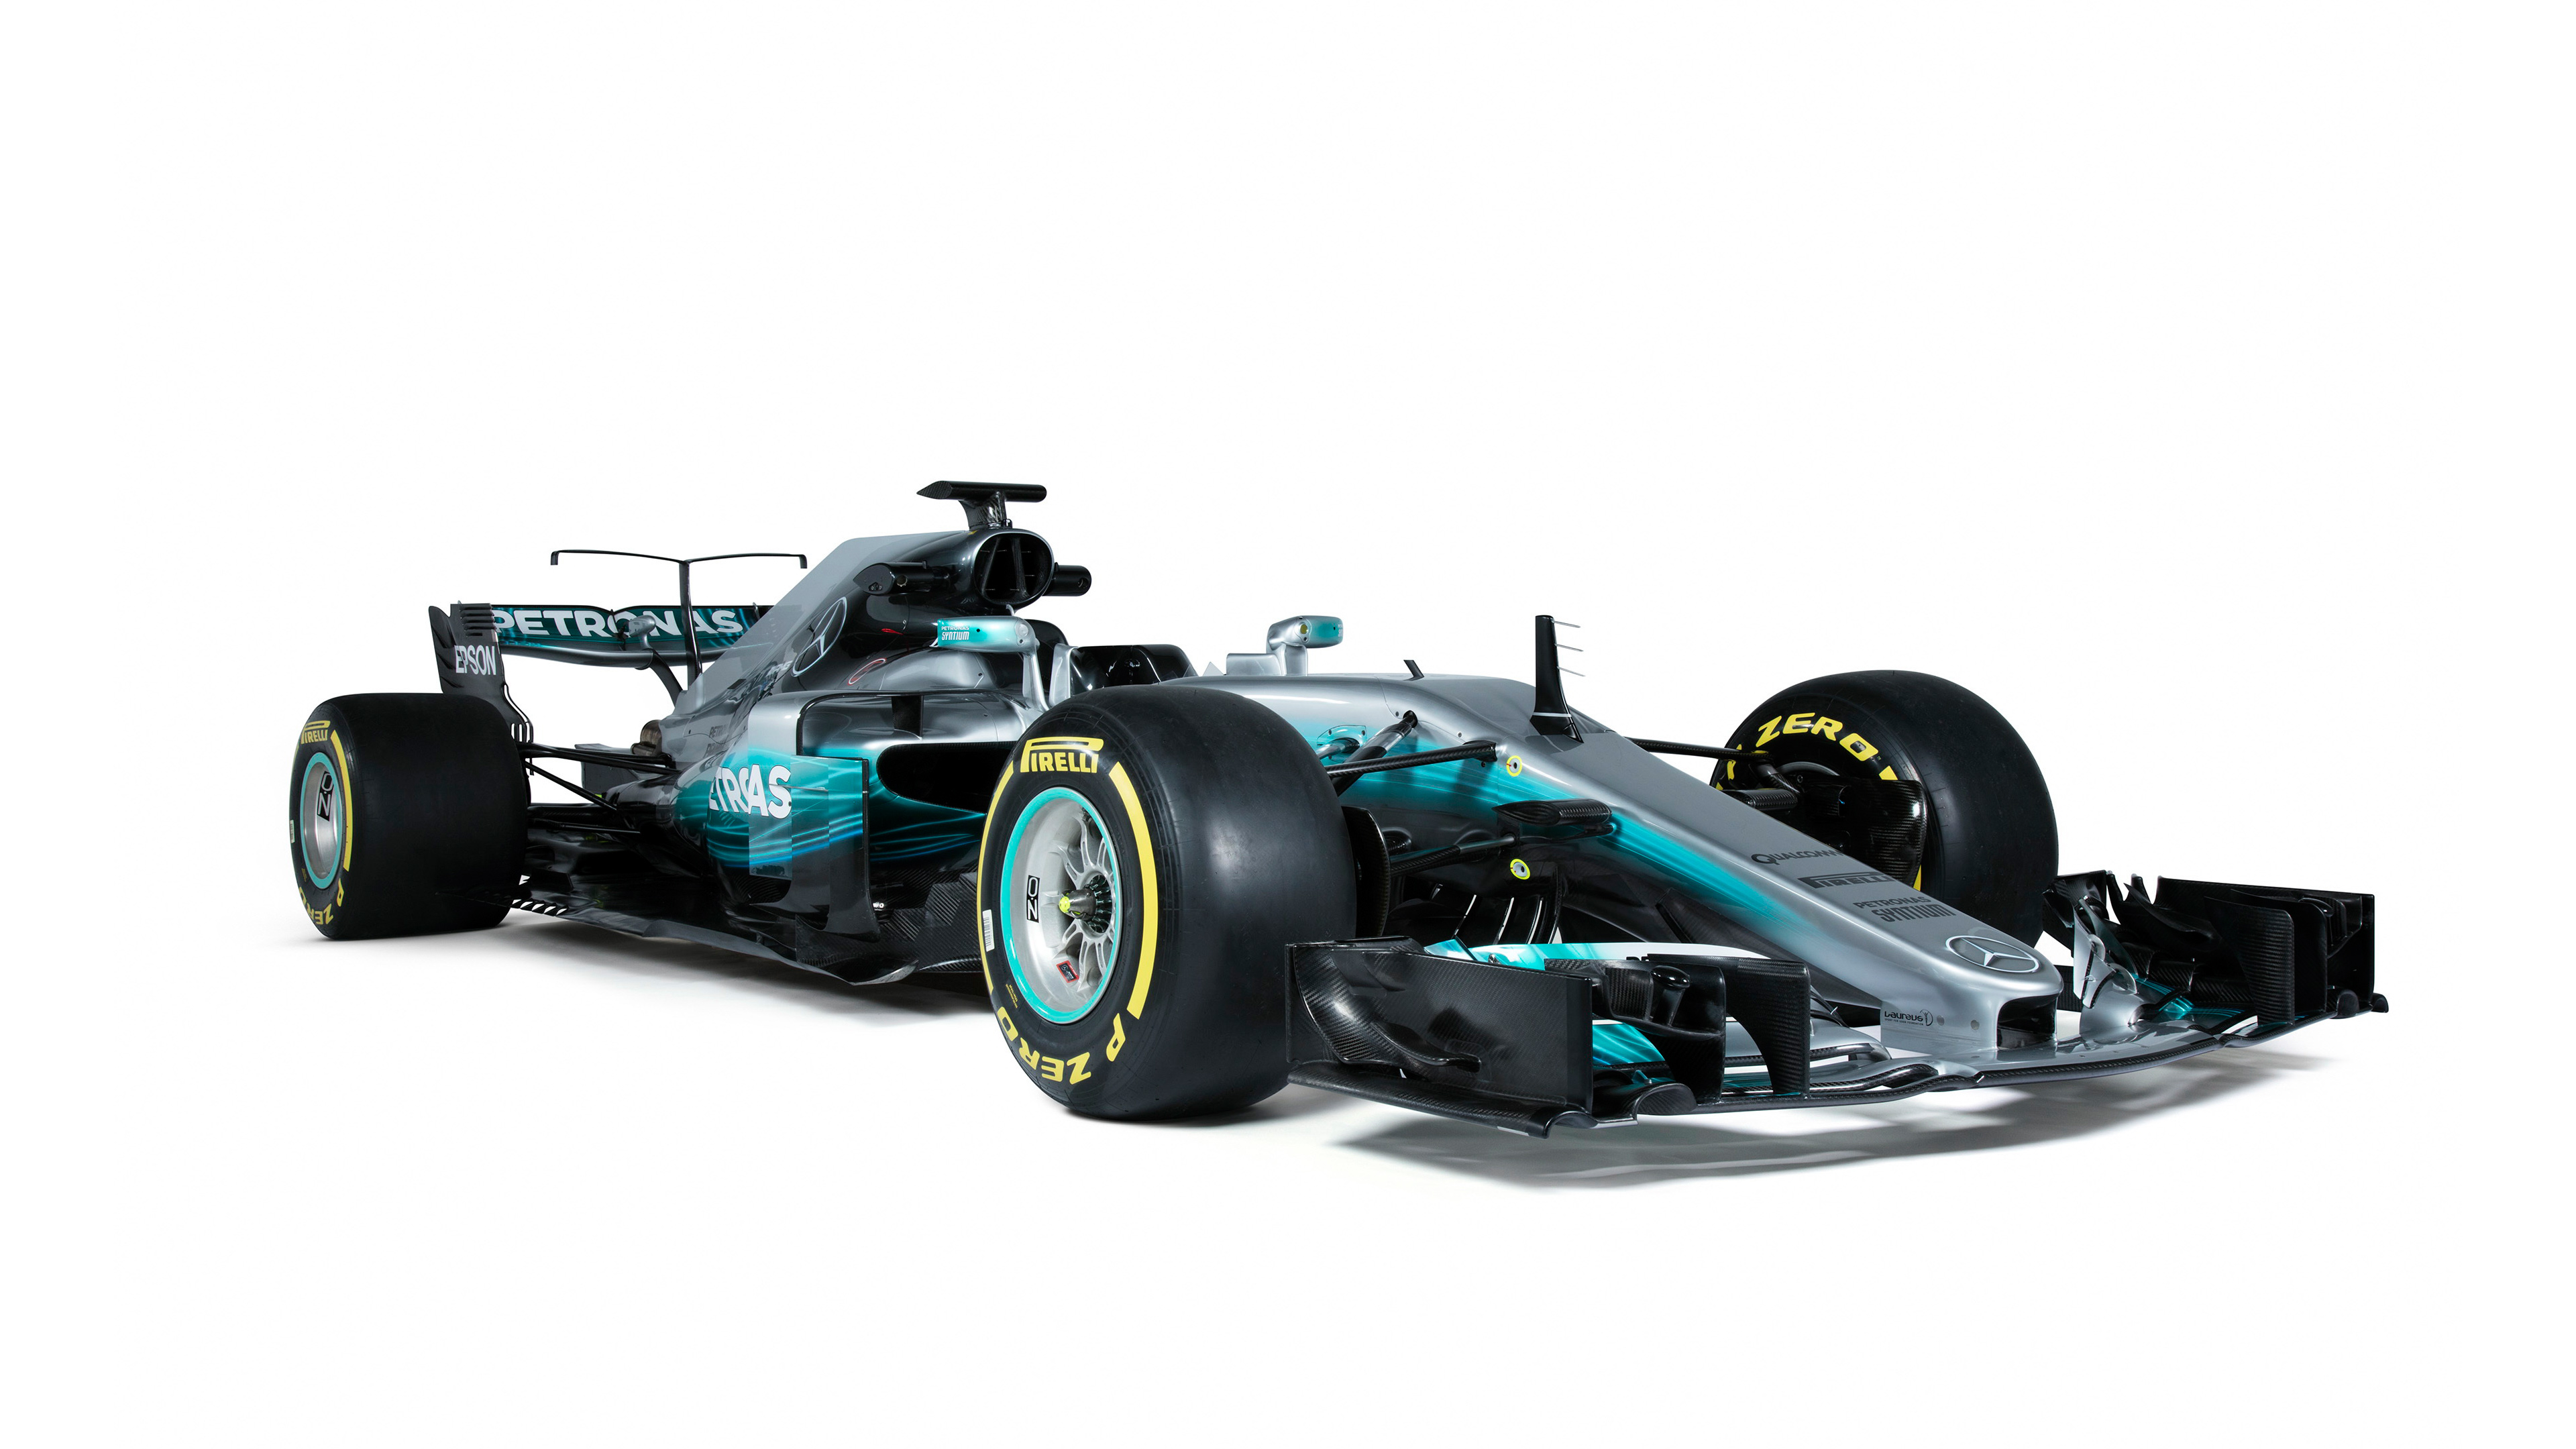 2017 mercedes amg f1 w08 eq power formula 1 car wallpaper for Mercedes benz formula 1